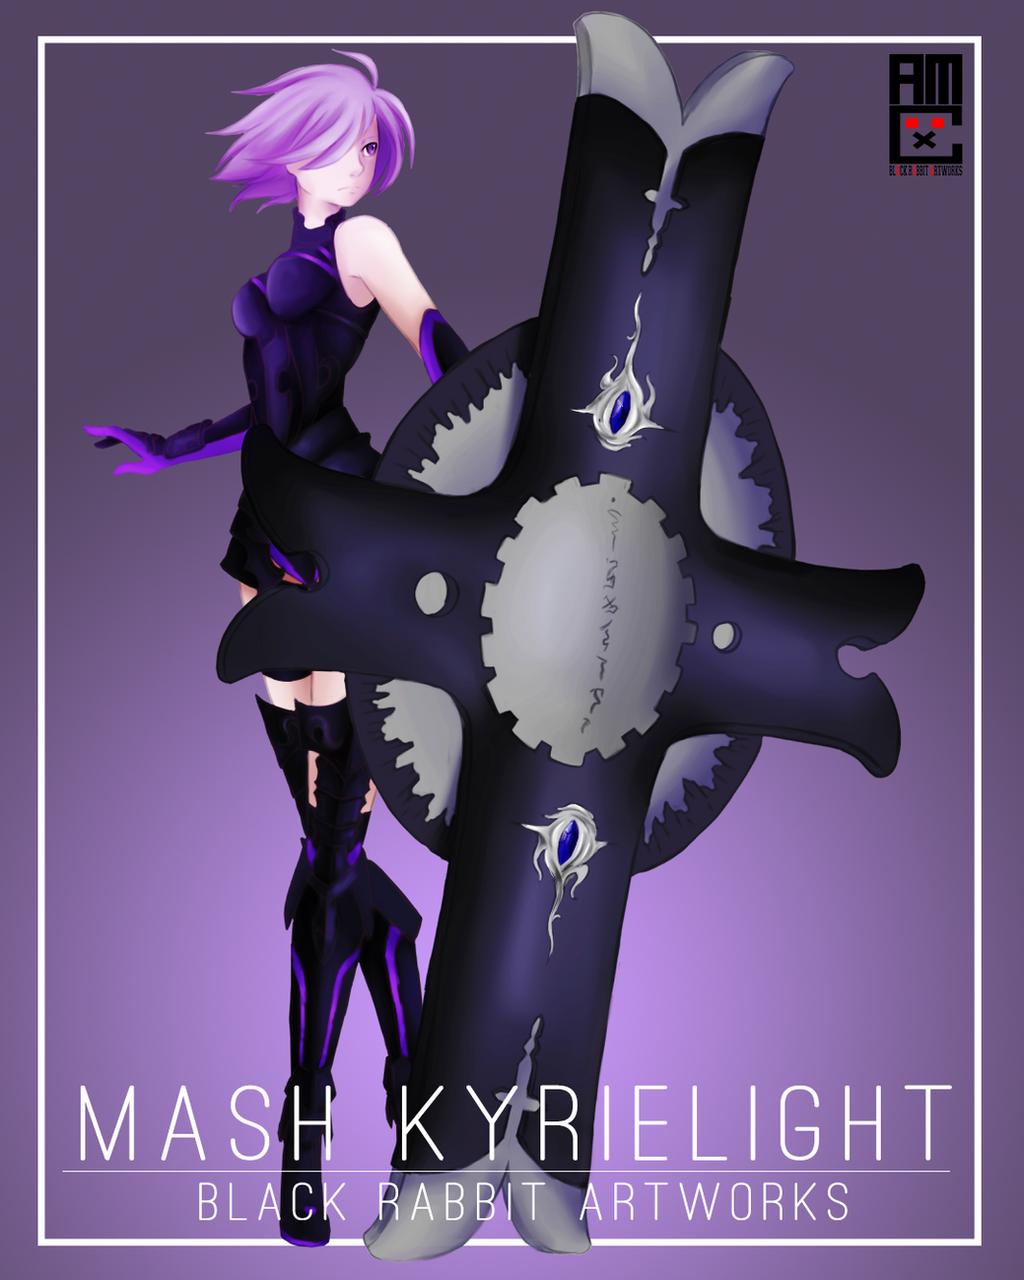 Mash Kyrielight by blackrabbitartworks